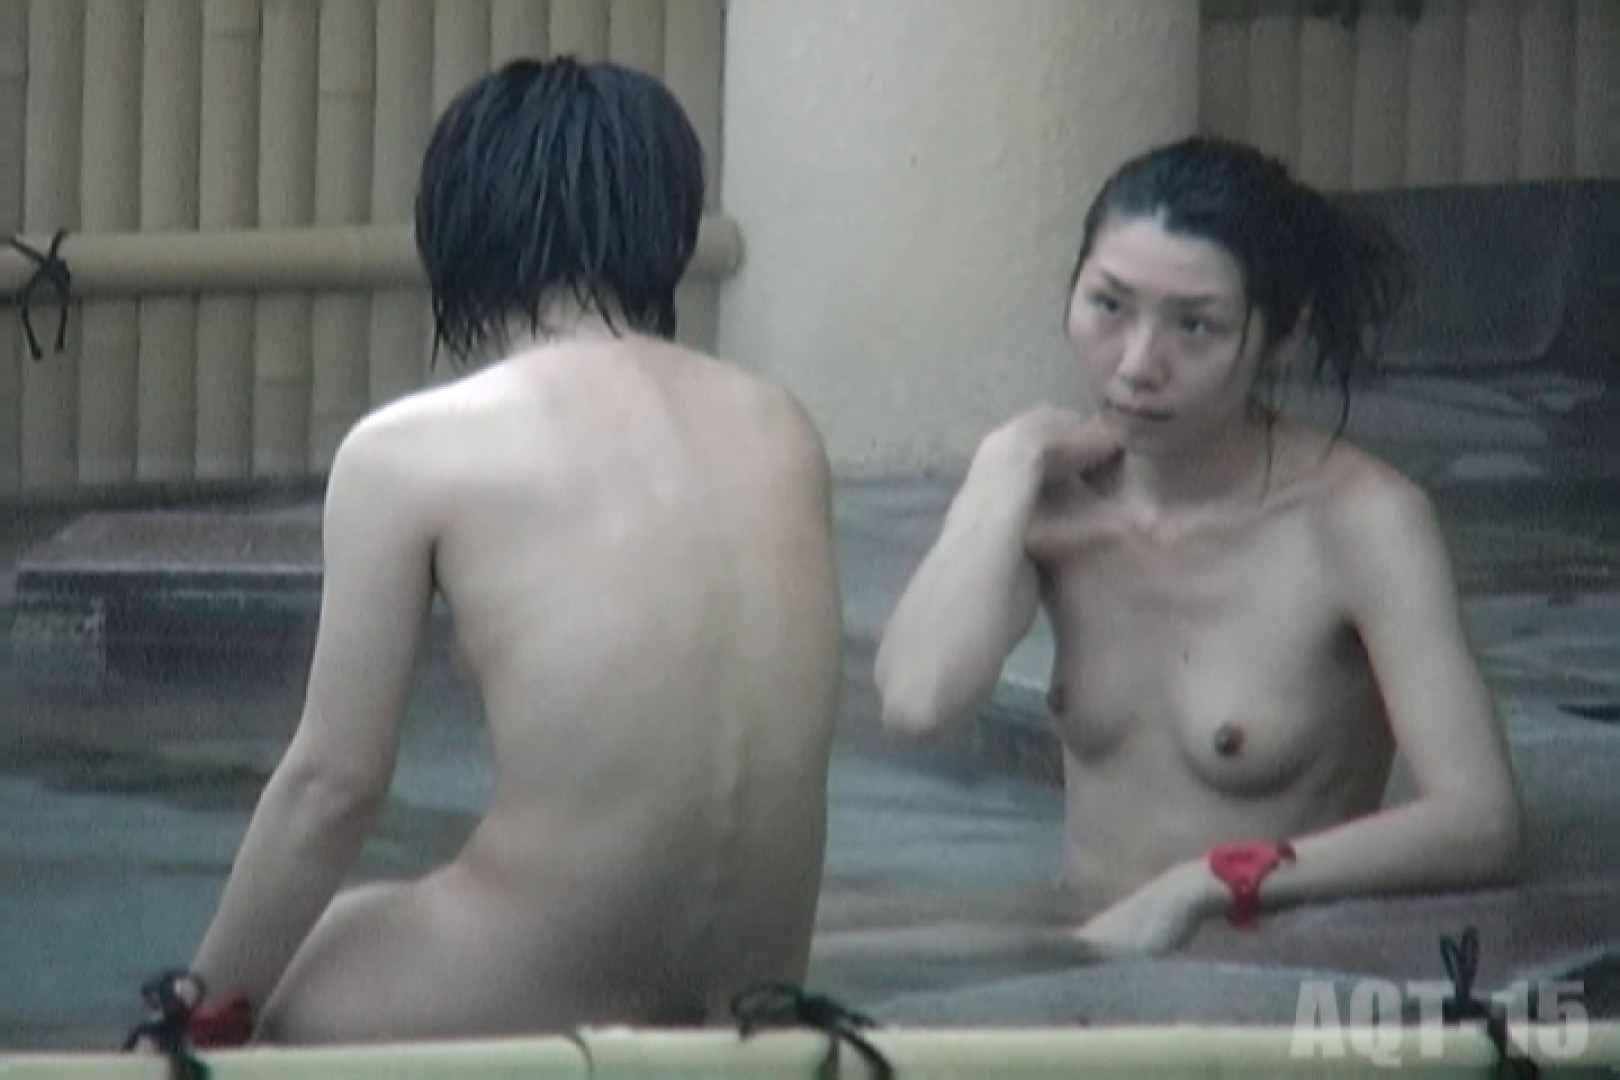 Aquaな露天風呂Vol.837 露天 われめAV動画紹介 103pic 94